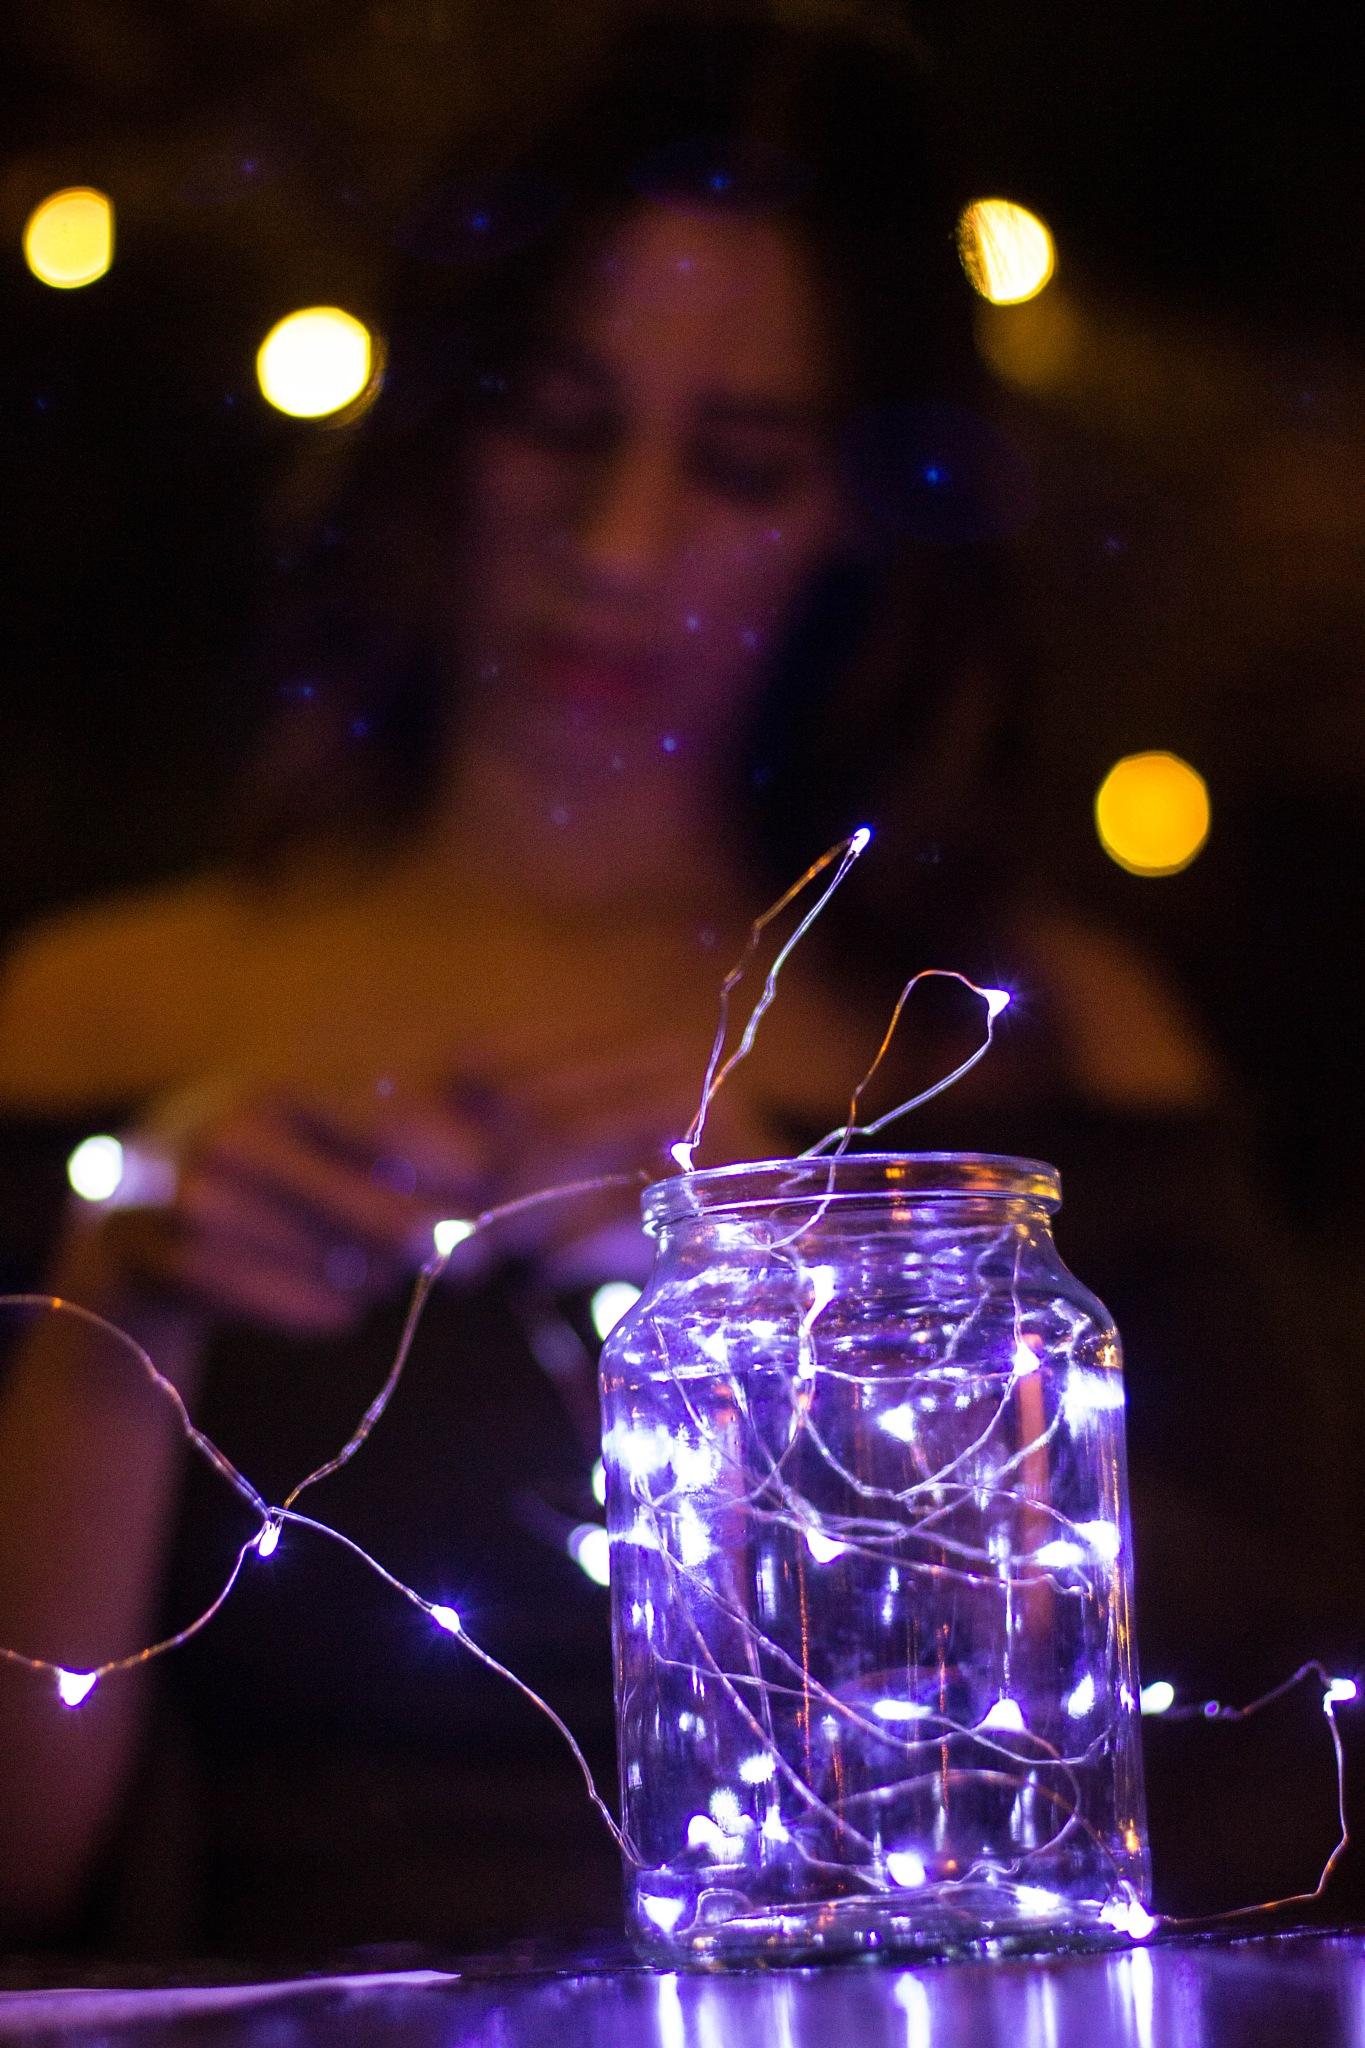 FairyJar by Dylan Curry